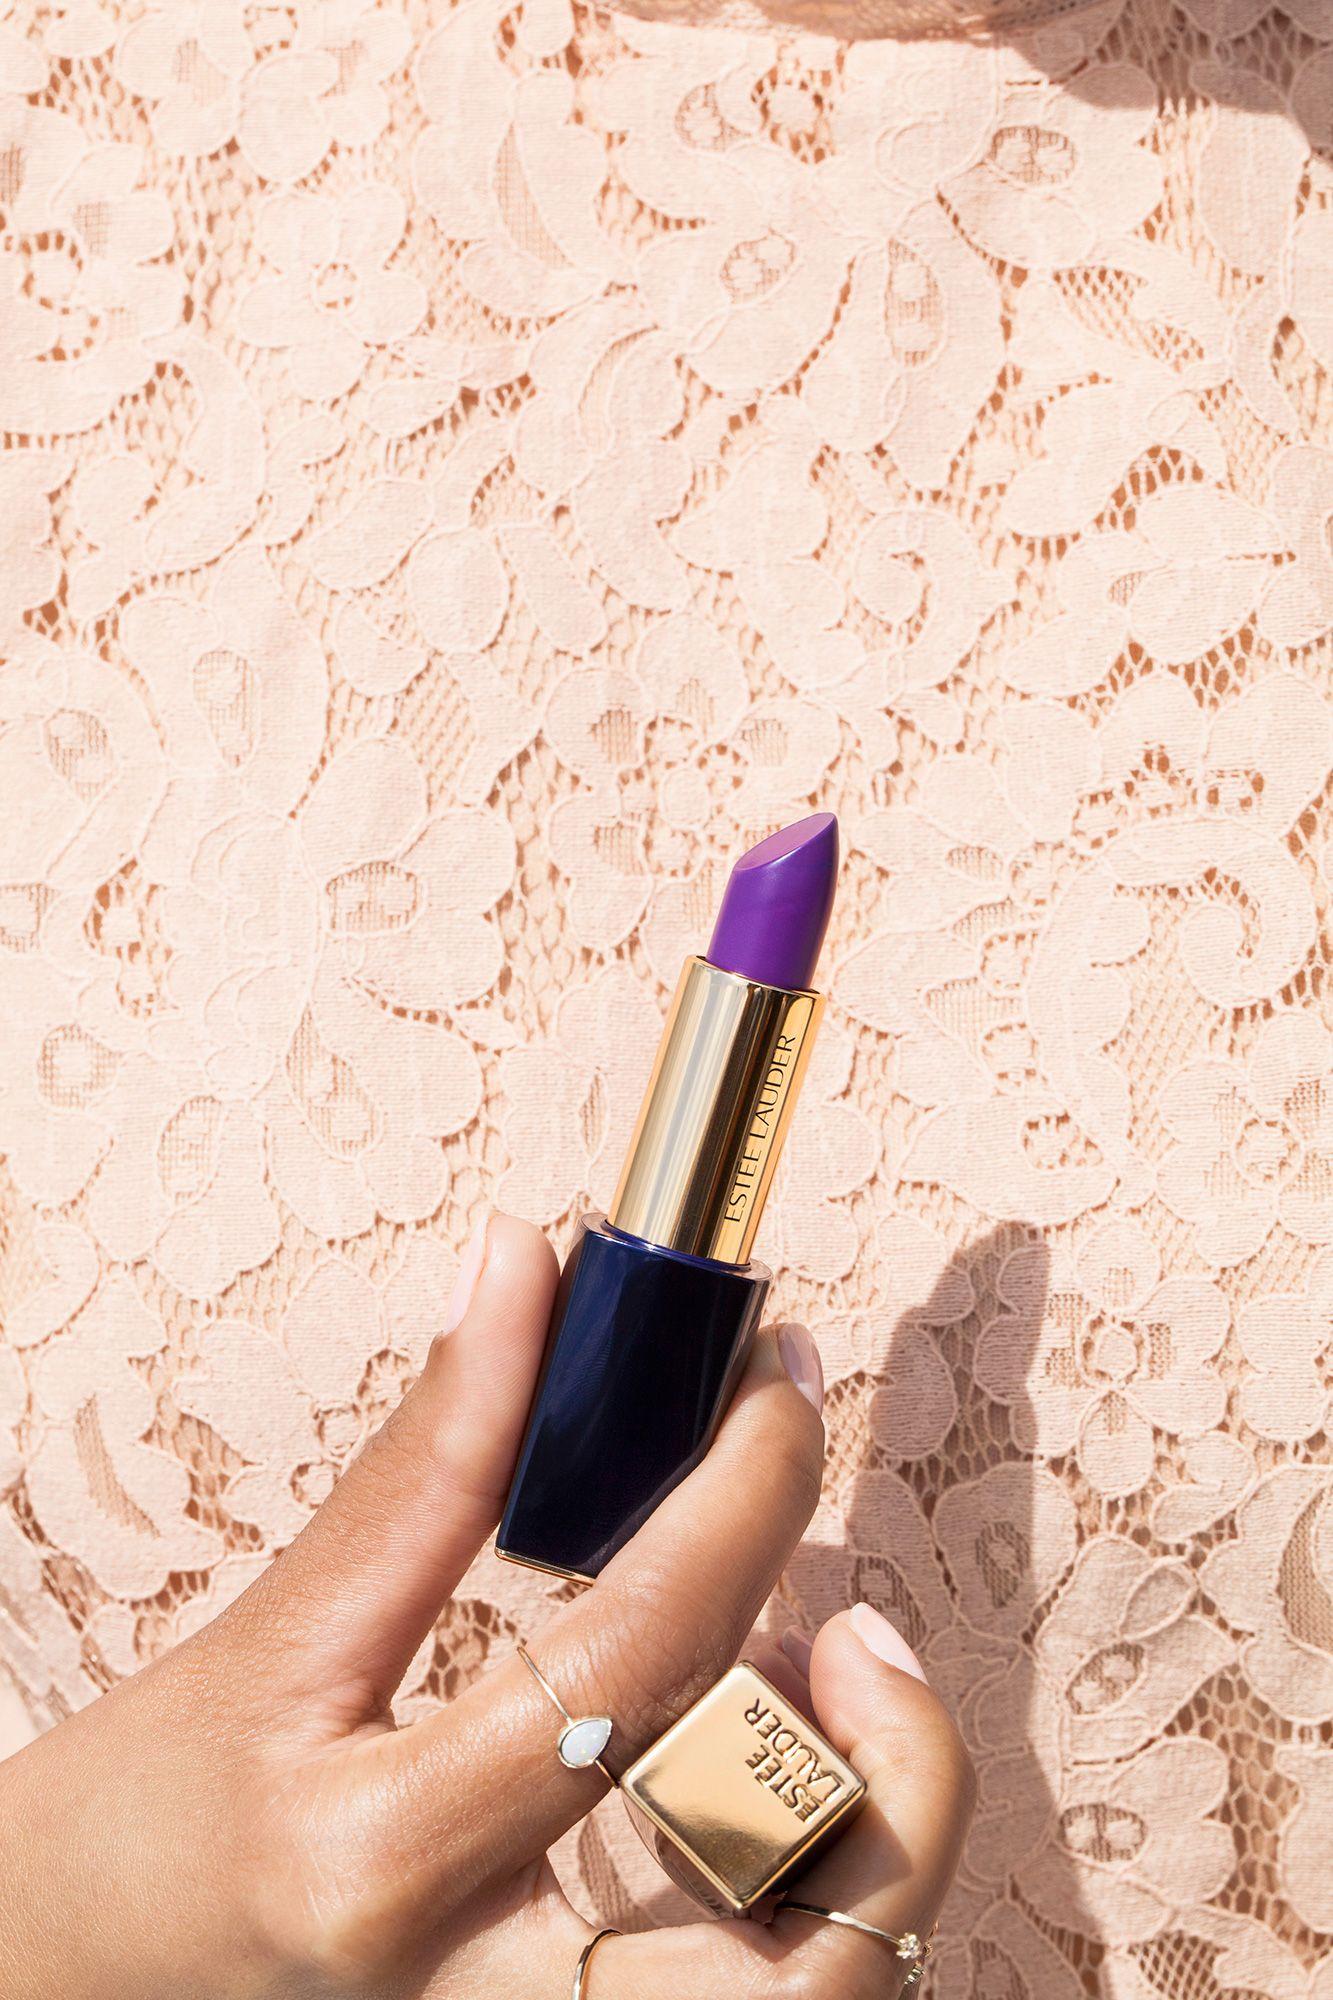 「Estée Lauder Pure Color Envy Matte Lipstick in Shameless Violet」的圖片搜尋結果